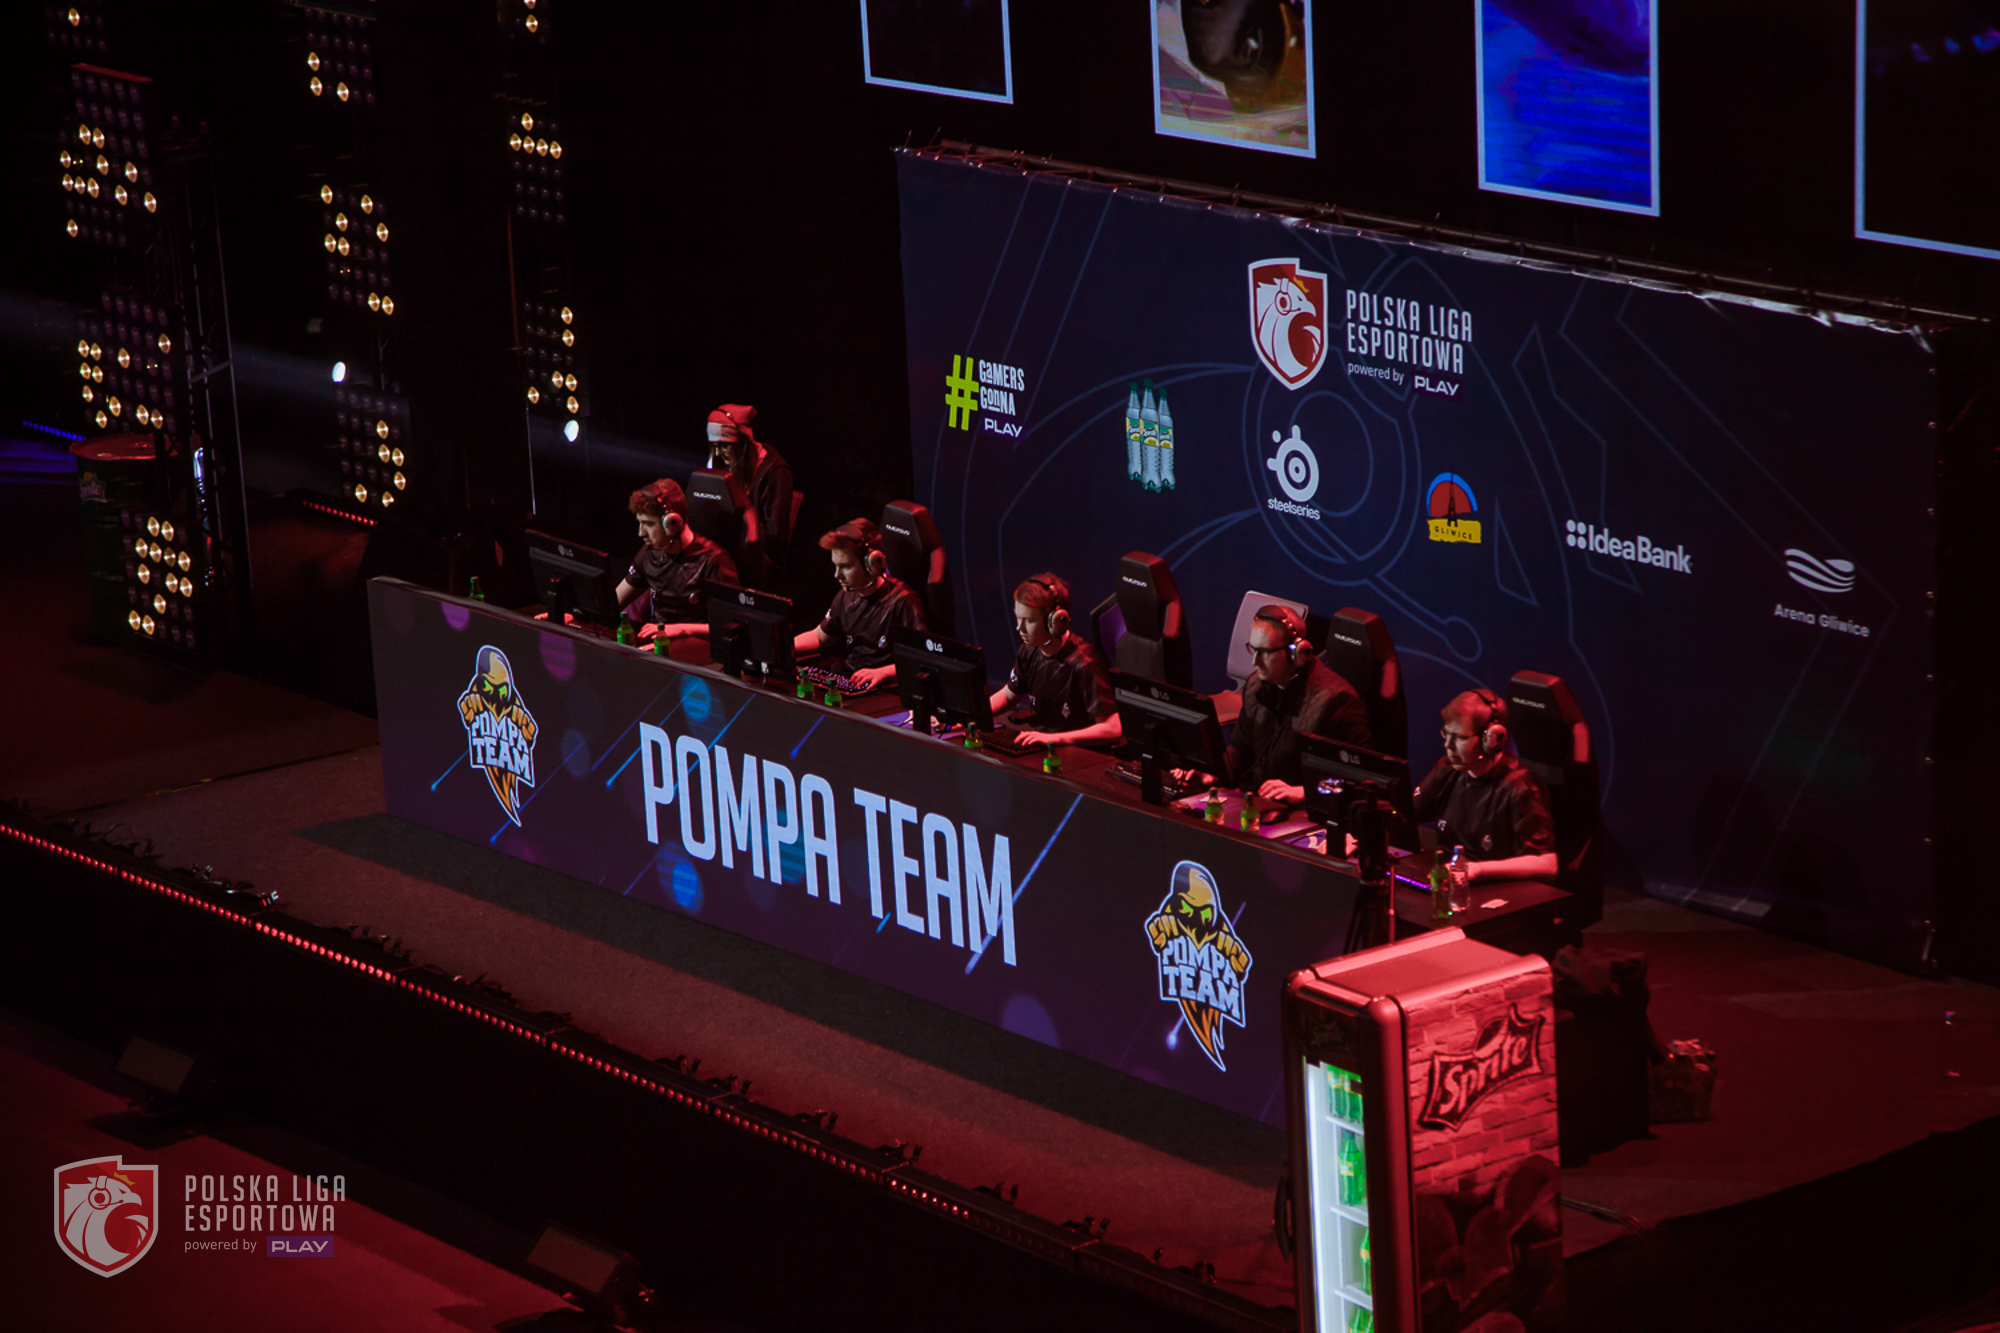 Polska Liga Esportowa - Pompa Team